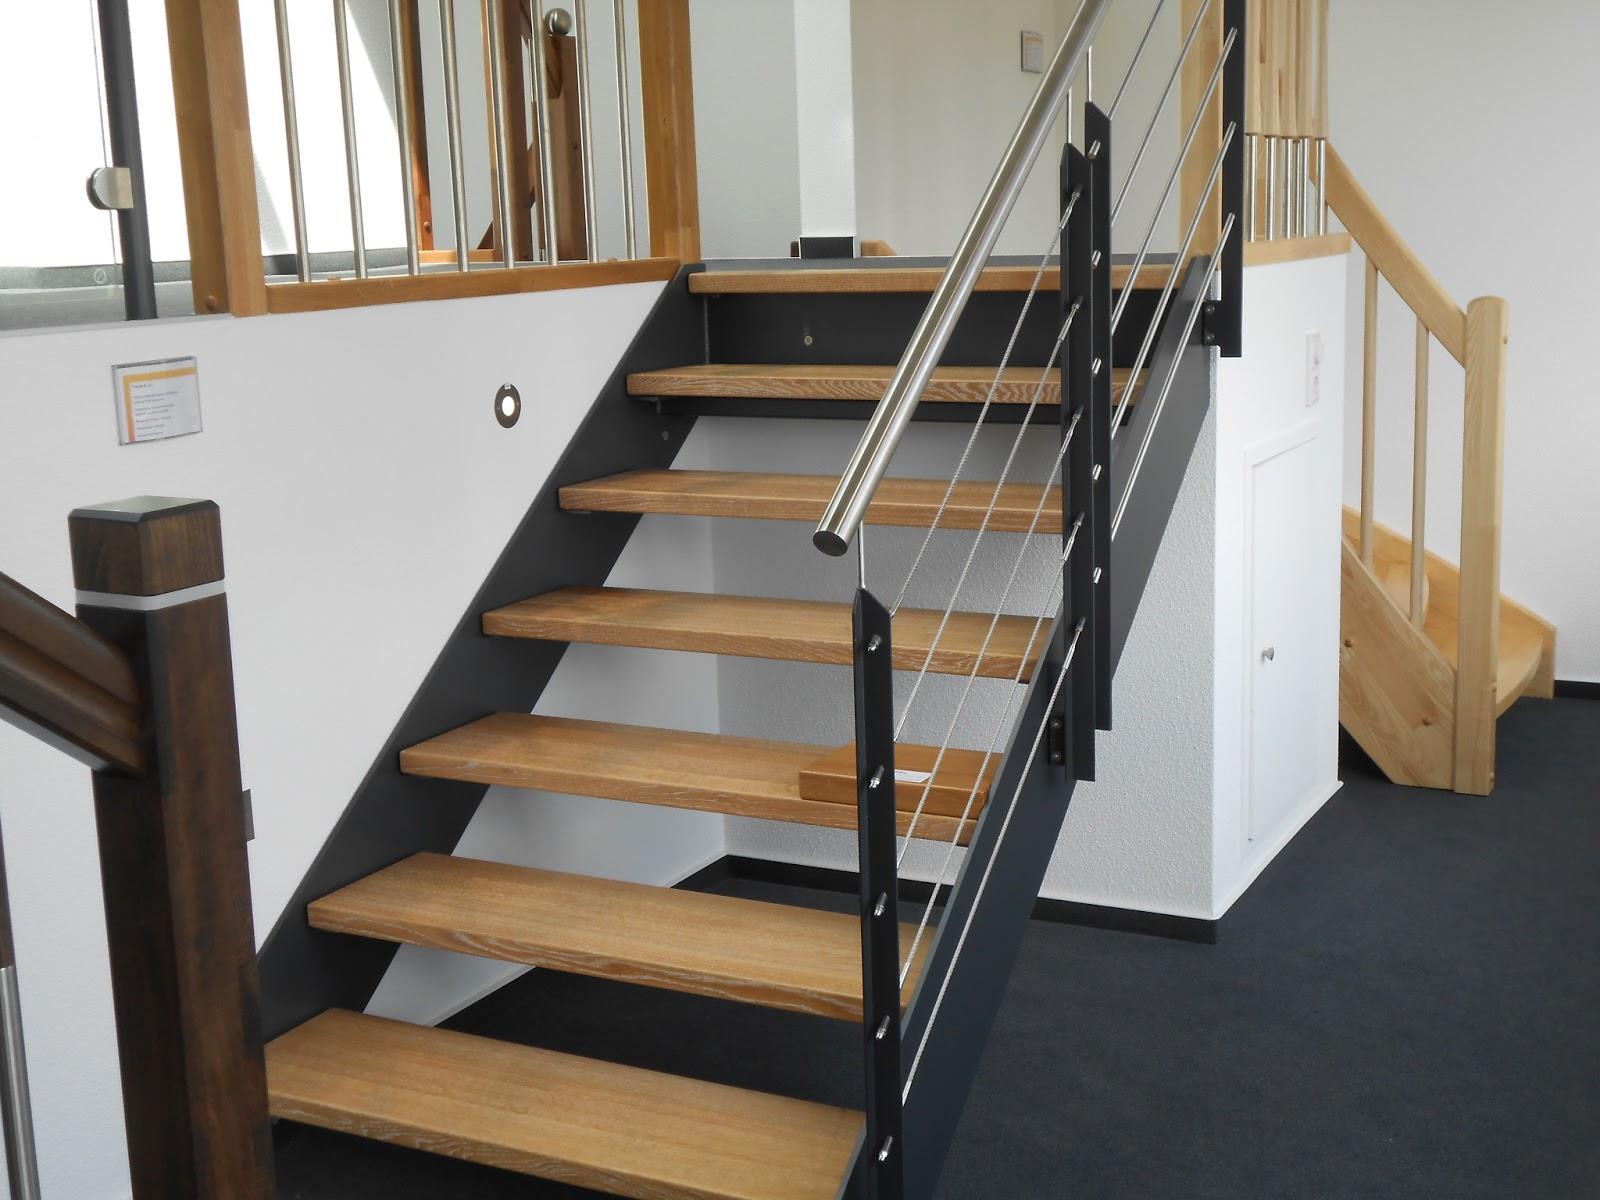 Fingerhaus vio treppe  Unser Bautagebuch: Bemusterung